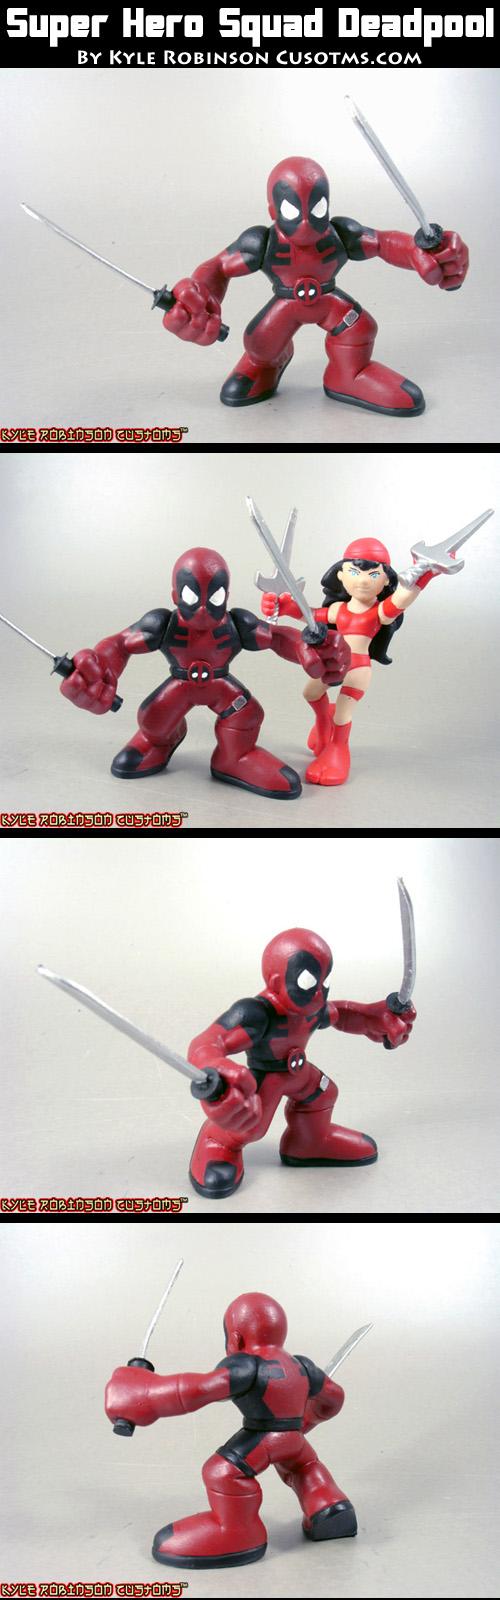 Super Hero Squad Deadpool by KyleRobinsonCustoms